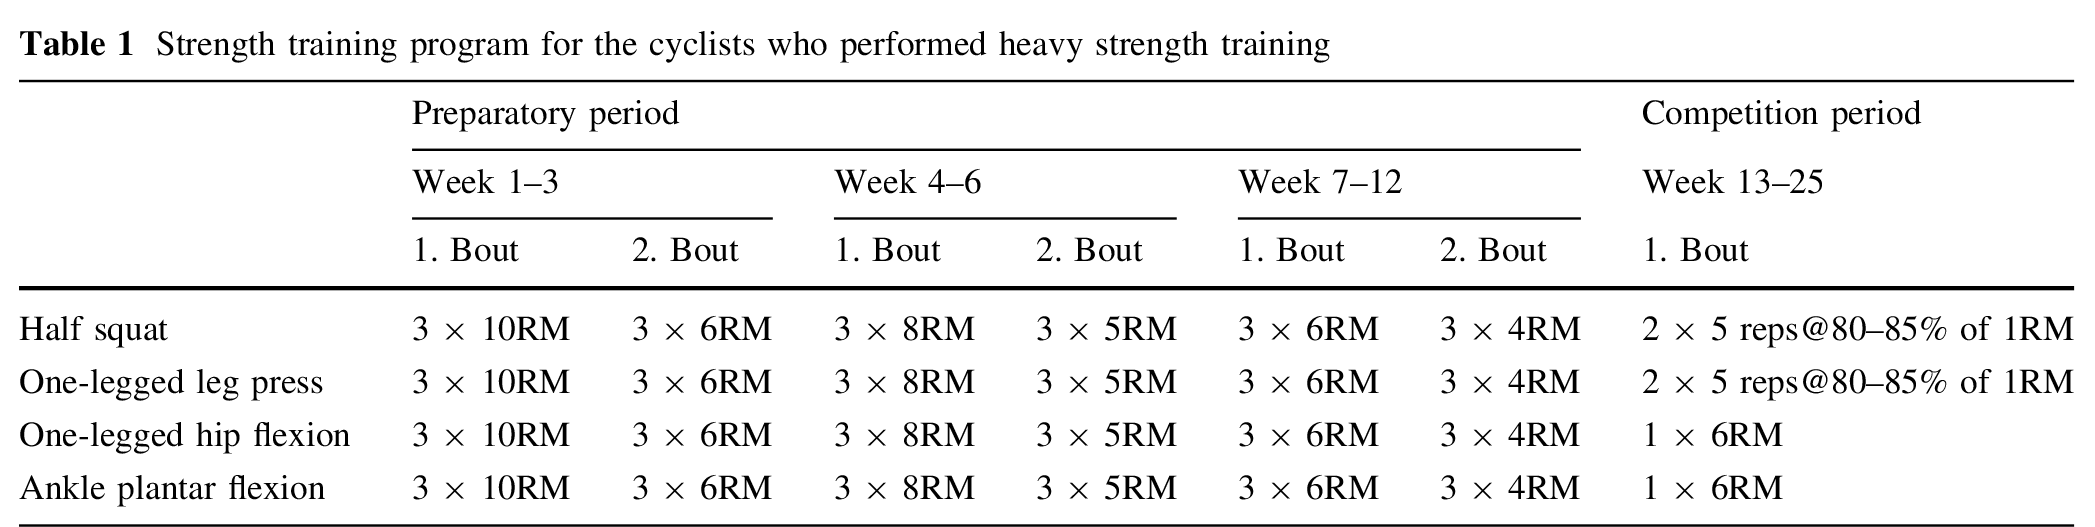 Strength training program for cyclists